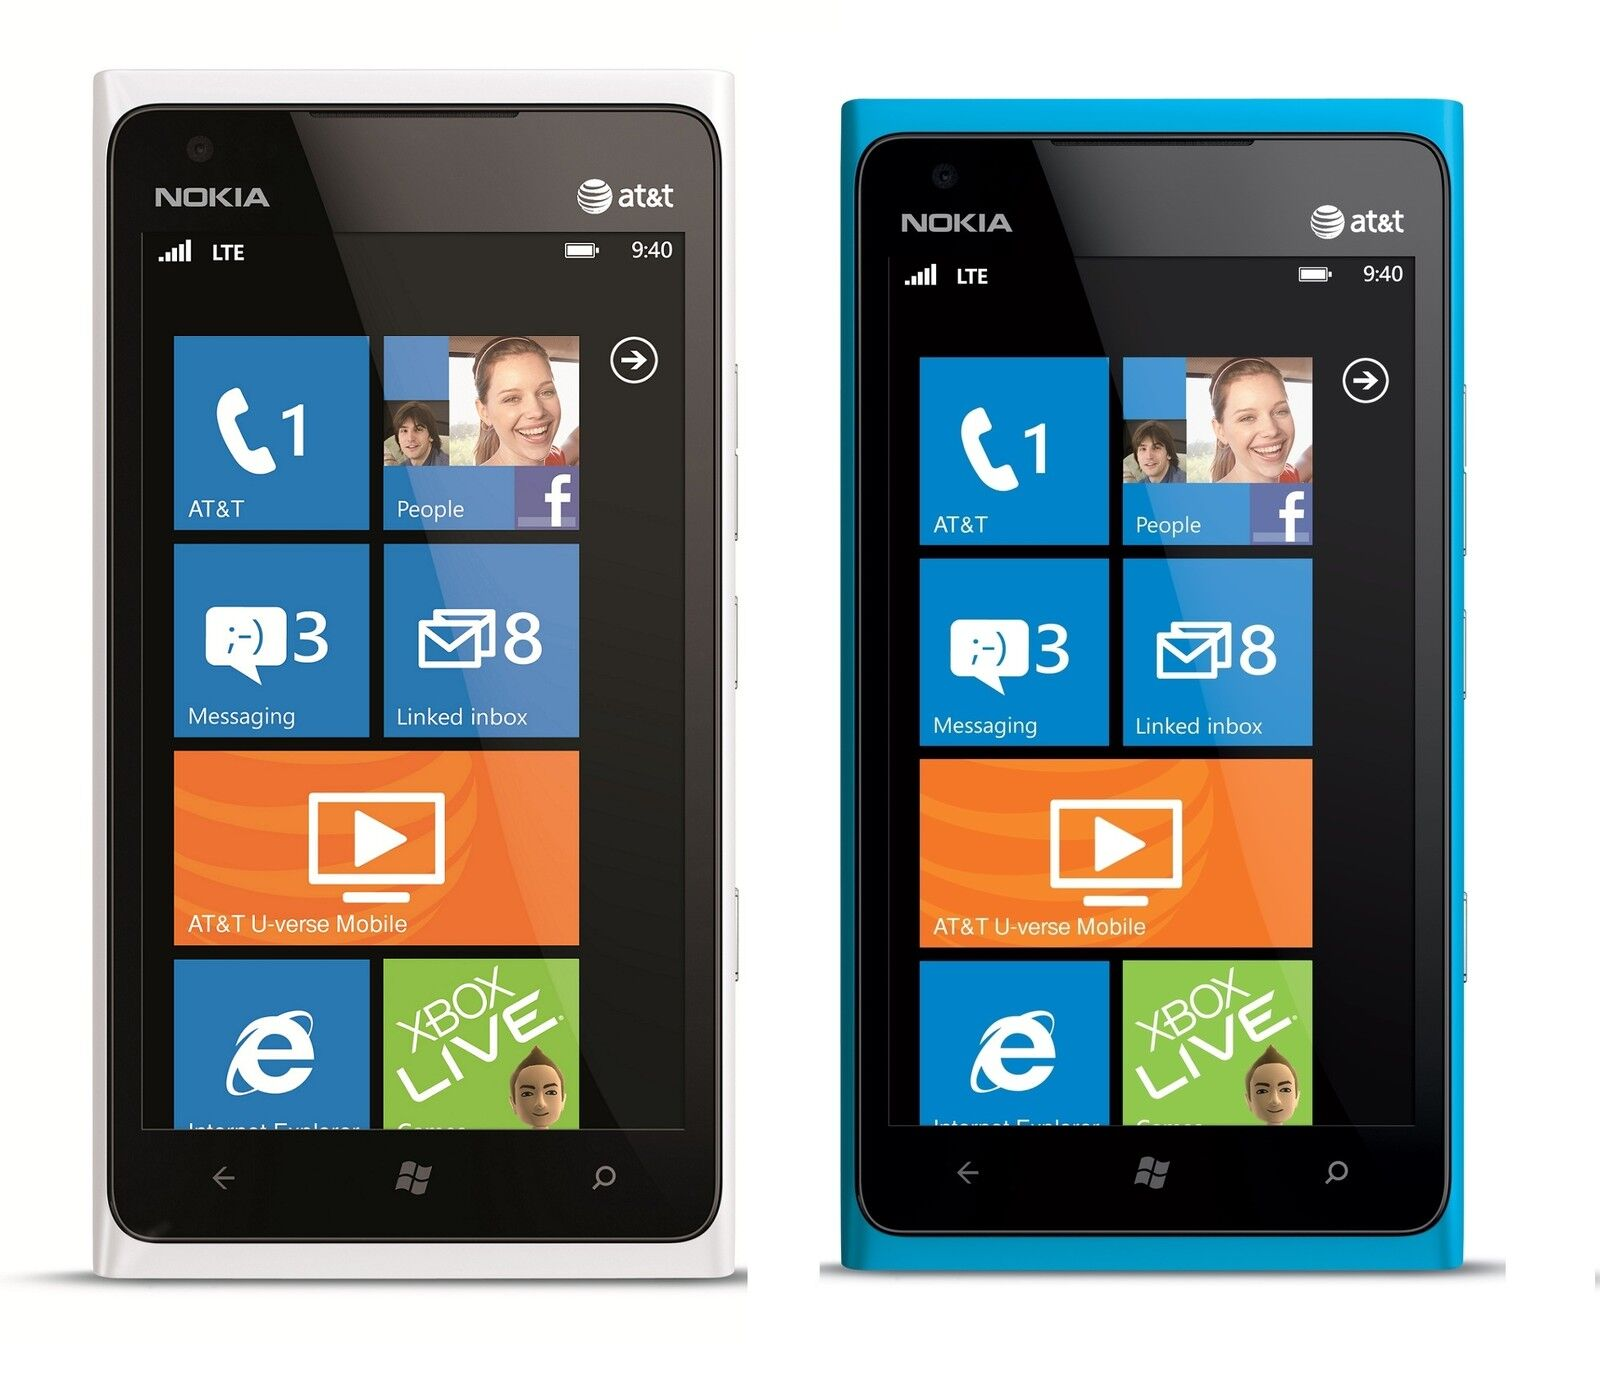 New Nokia Lumia 900 16GB Unlocked GSM Phone Windows 7 8 OS 8MP Camera GPS Wi Fi